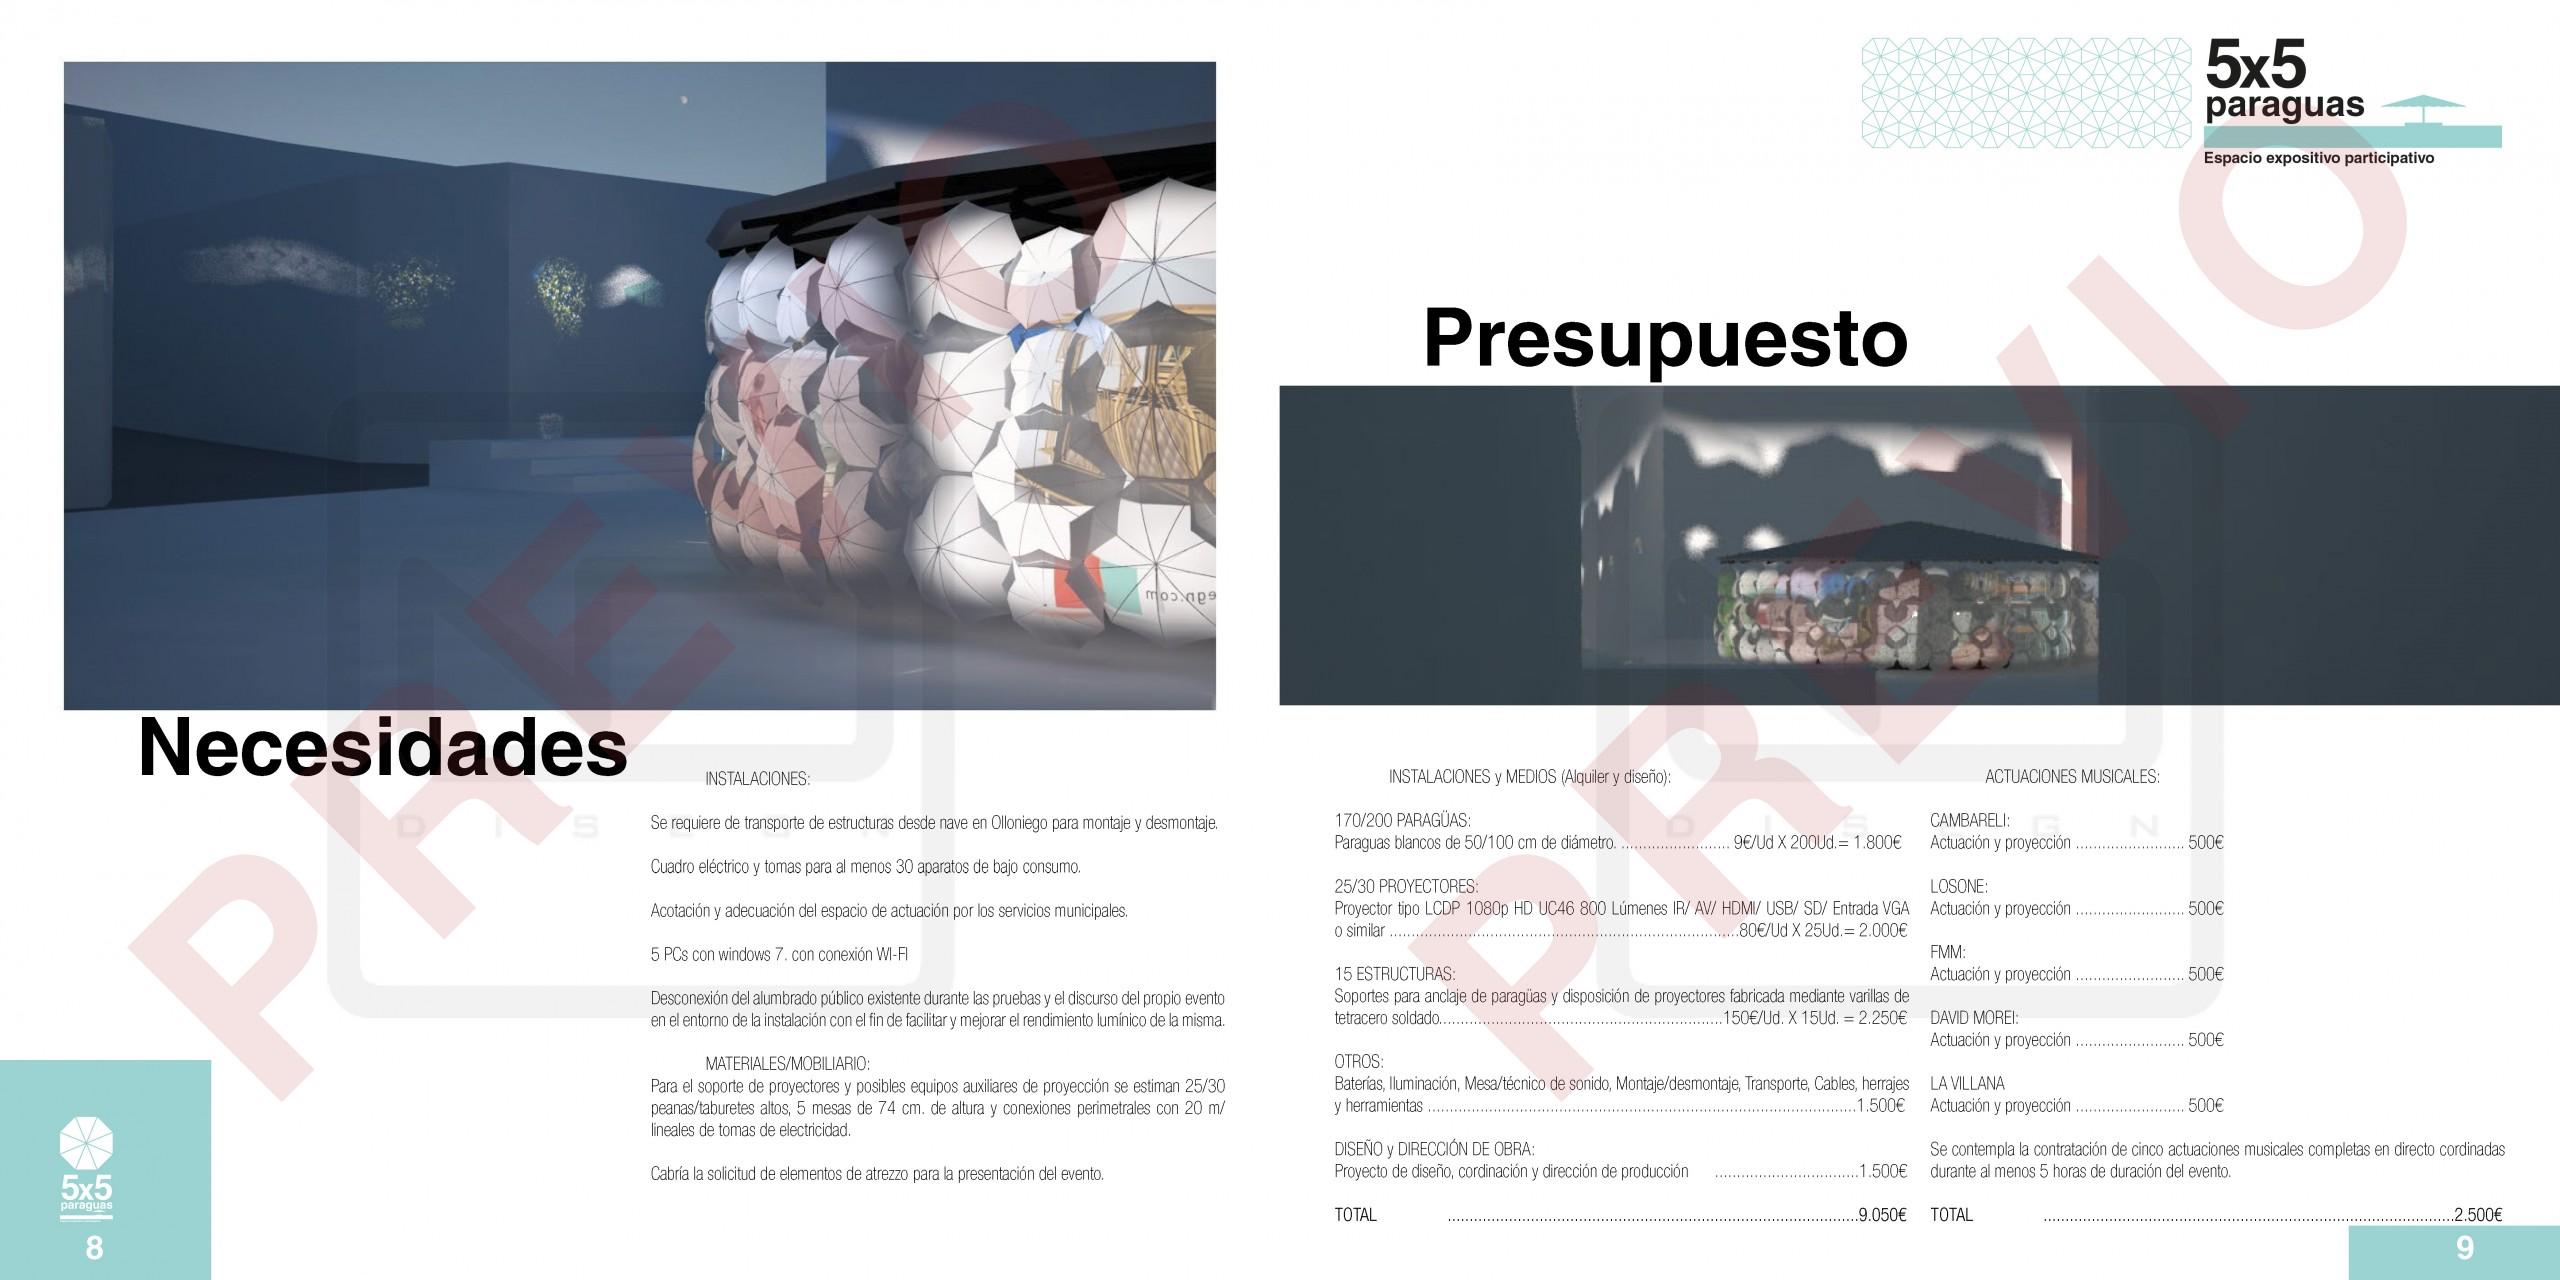 5x5 paraguas - Noche Blanca Oviedo 2016